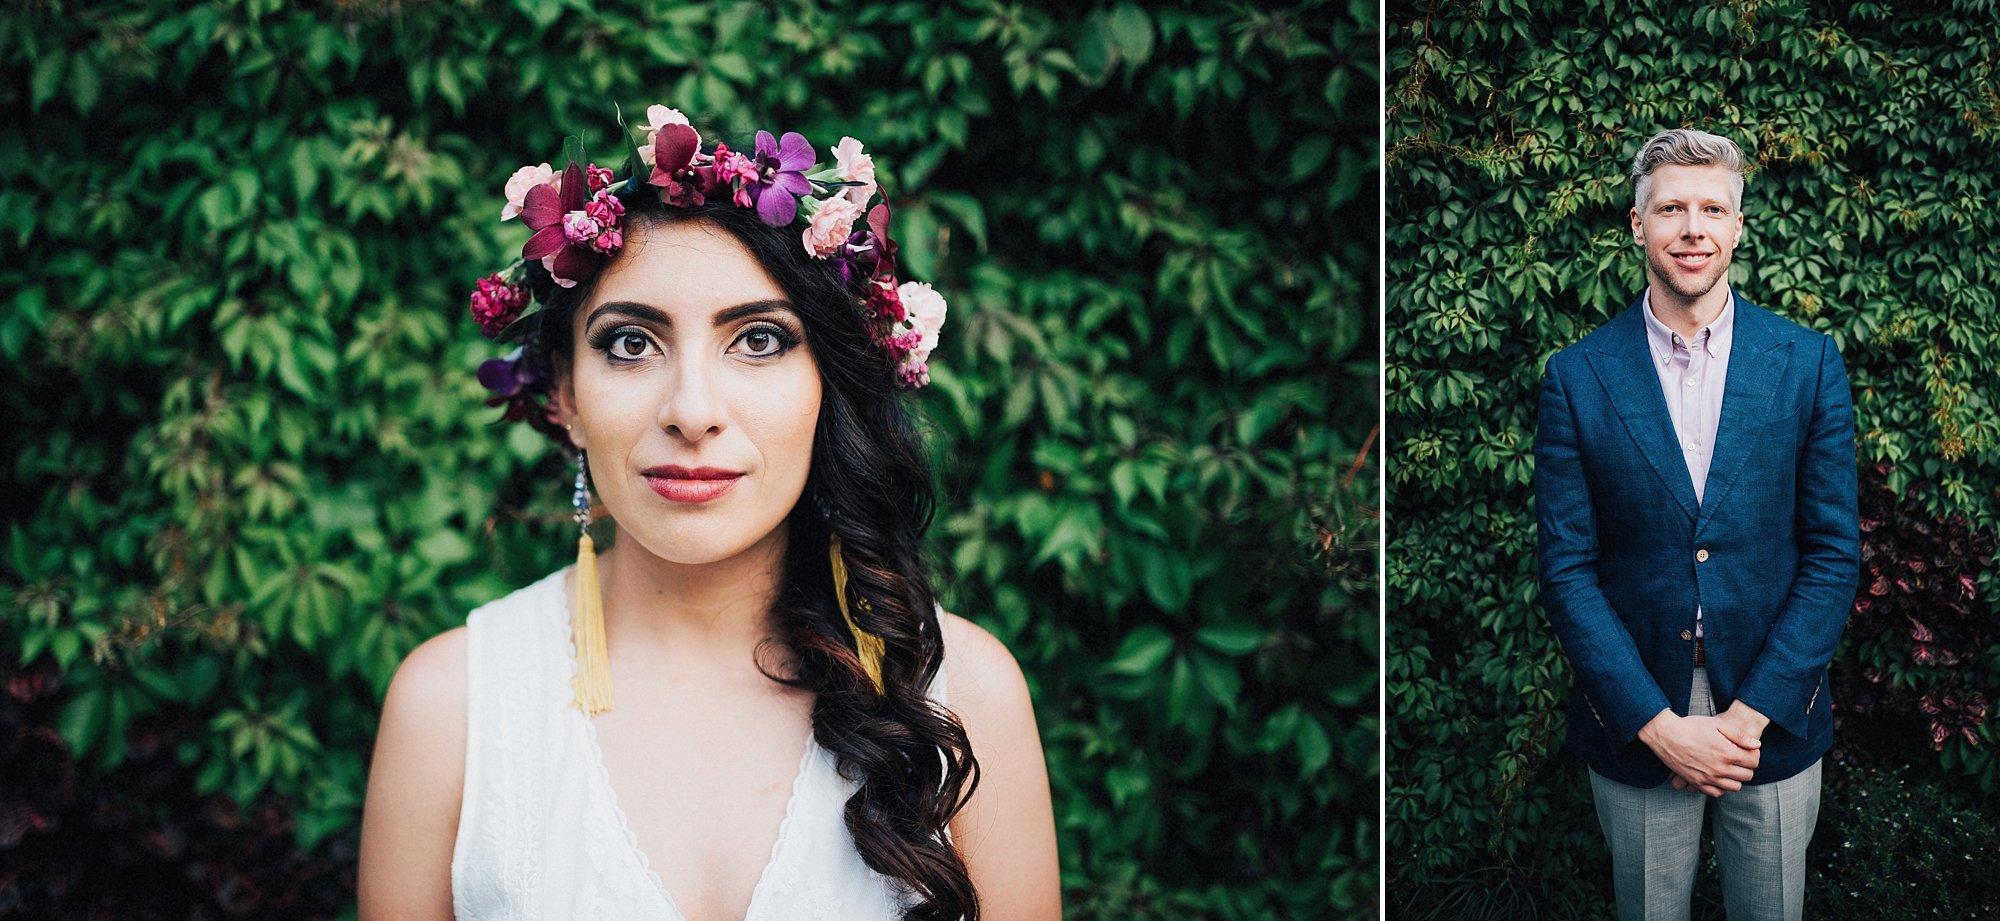 alex-yazmin-wedding-photographer-antigua-guatemala-035